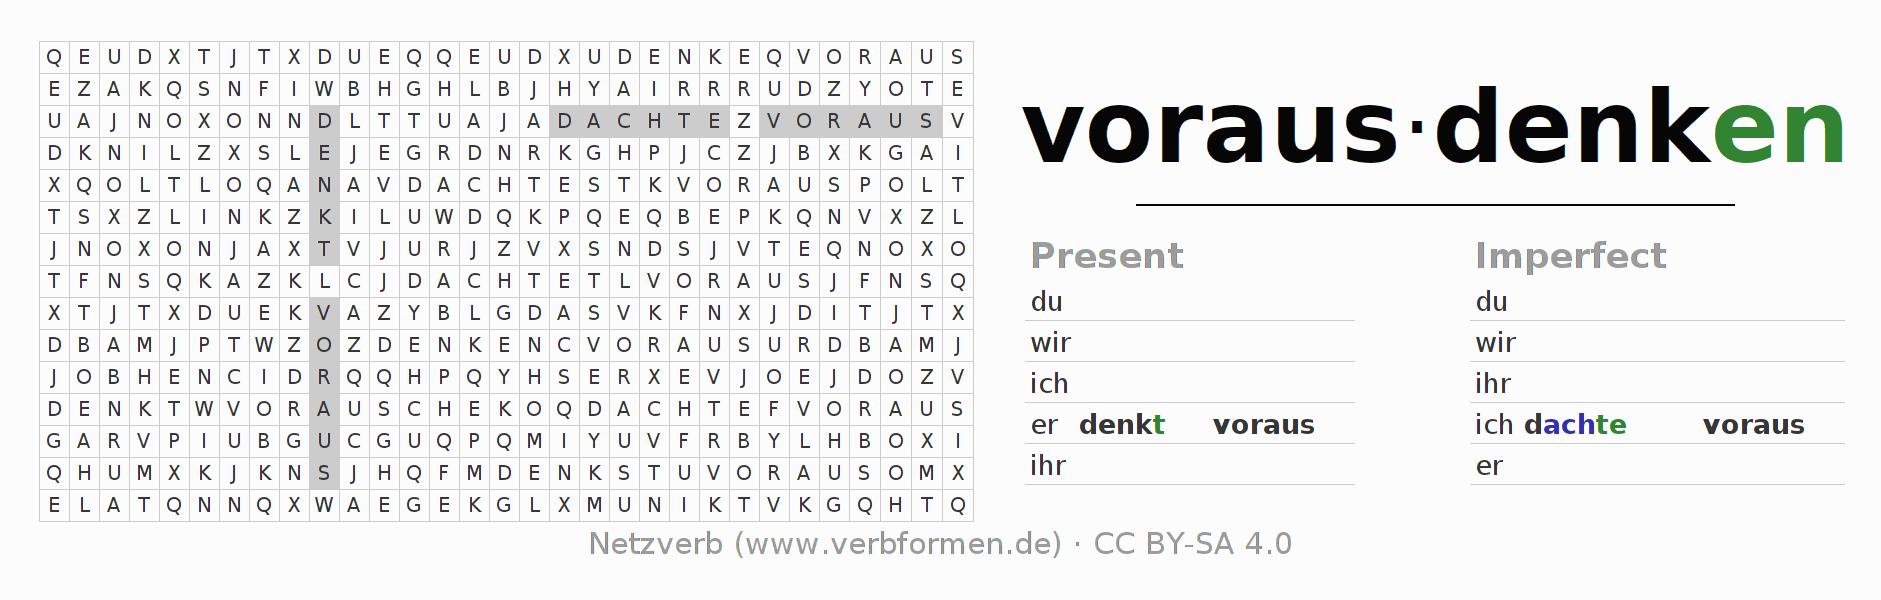 Word search | Verb vorausdenken | Puzzle for the conjugation